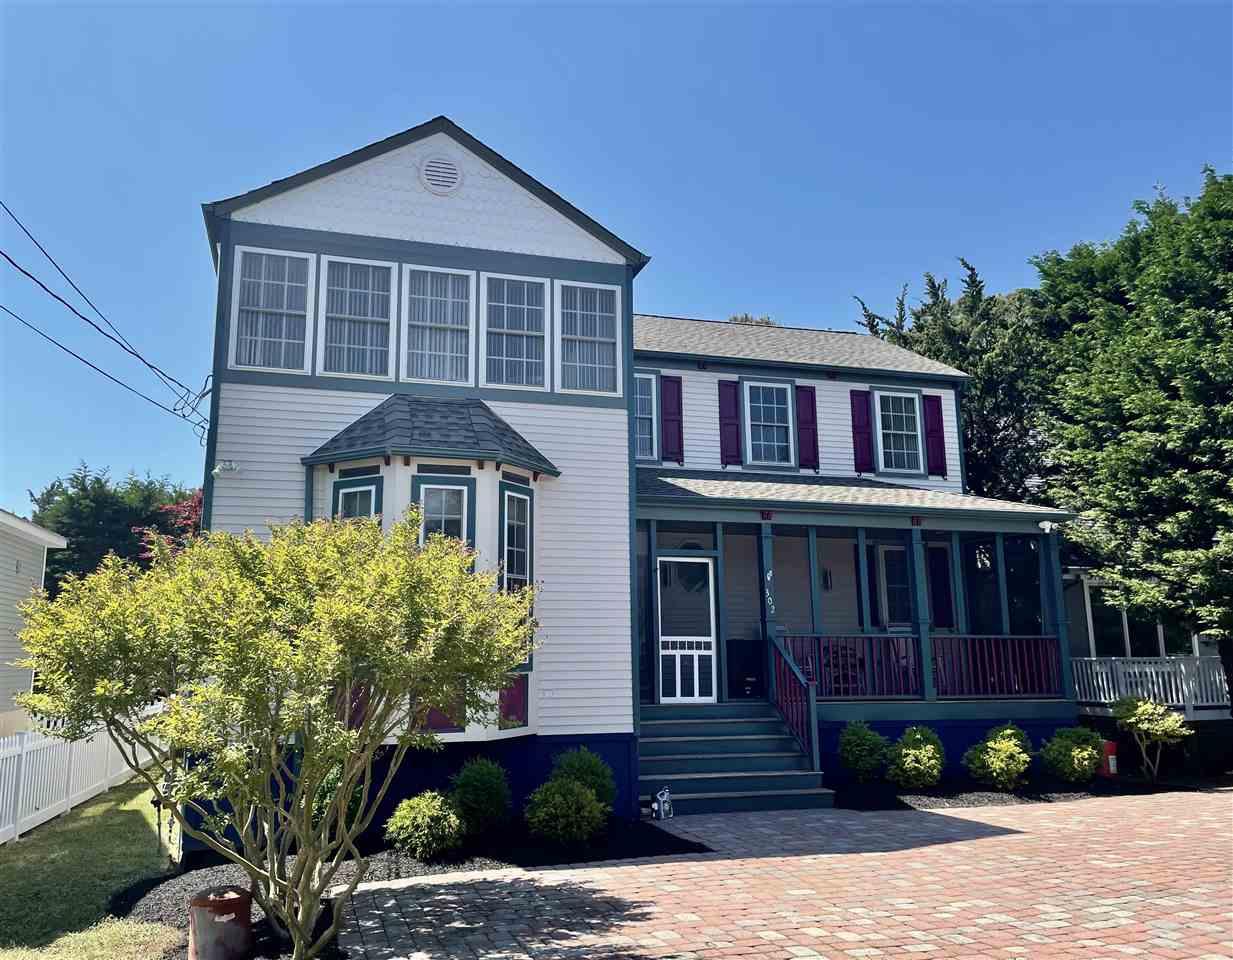 302 Seagrove Avenue, Cape May Point, NJ 08212-3111